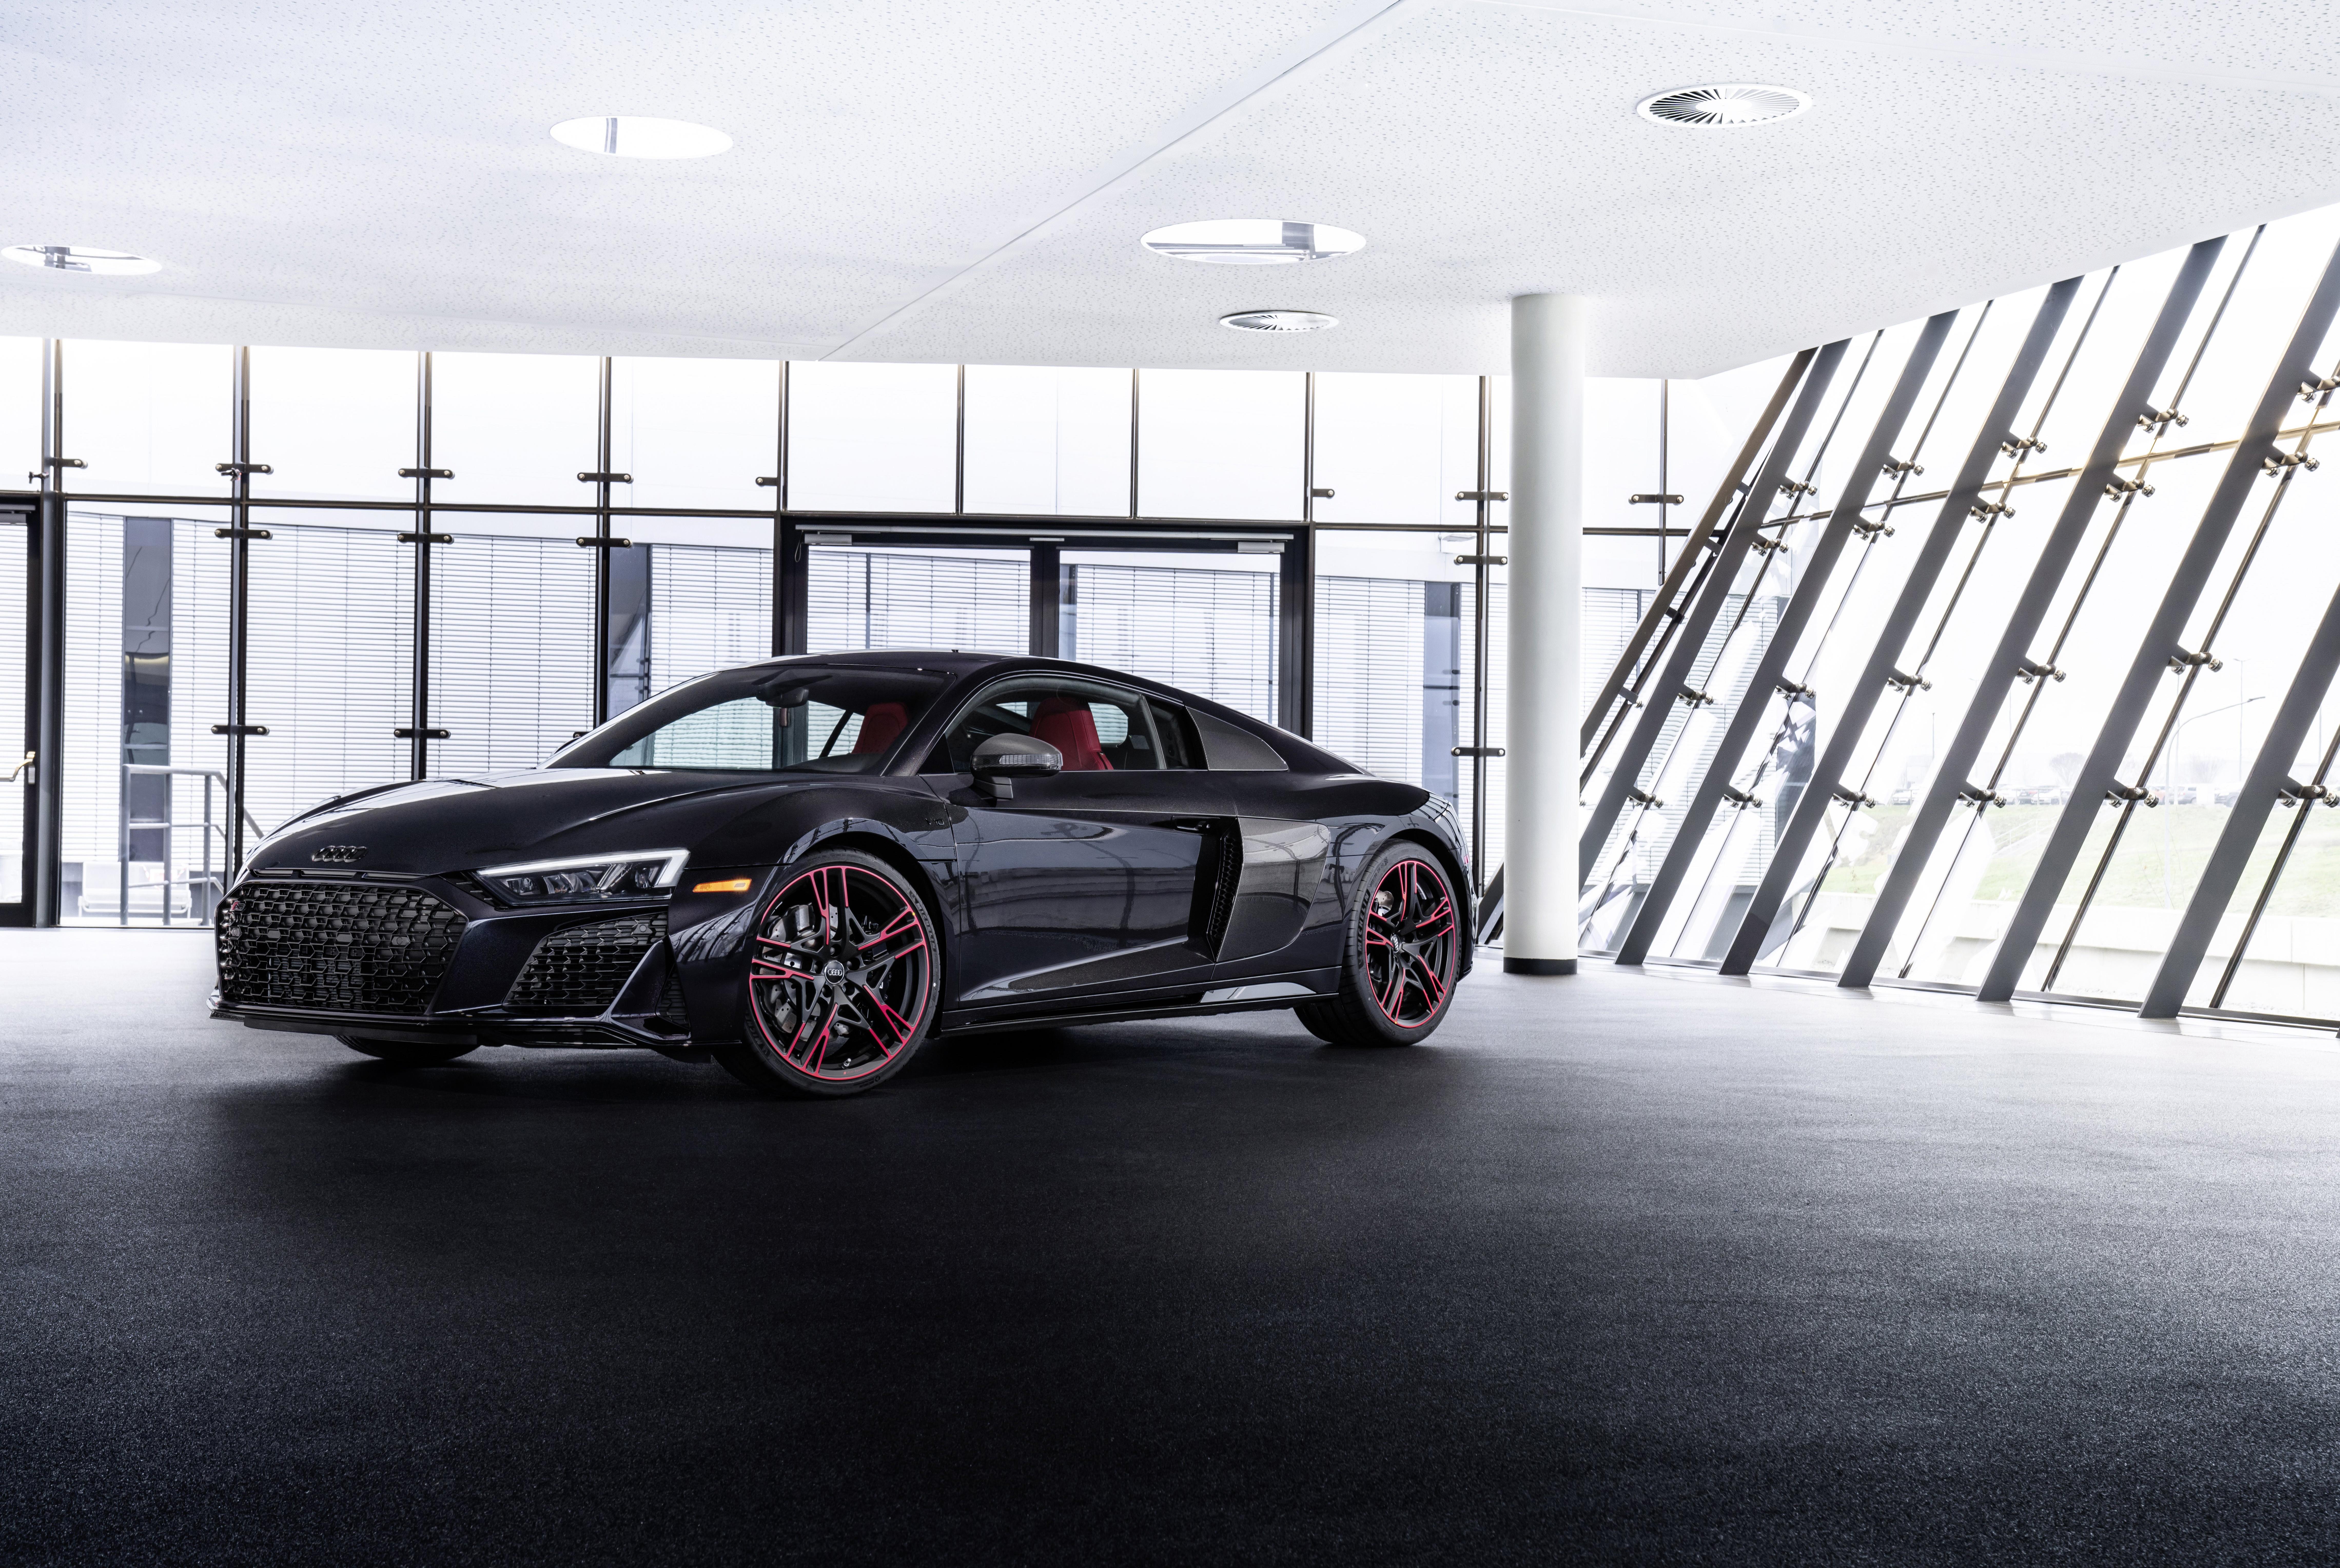 2021 audi r8 rwd panther edition 4k 1608916730 - 2021 Audi R8 RWD Panther Edition 4k - 2021 Audi R8 RWD Panther Edition 4k wallpapers